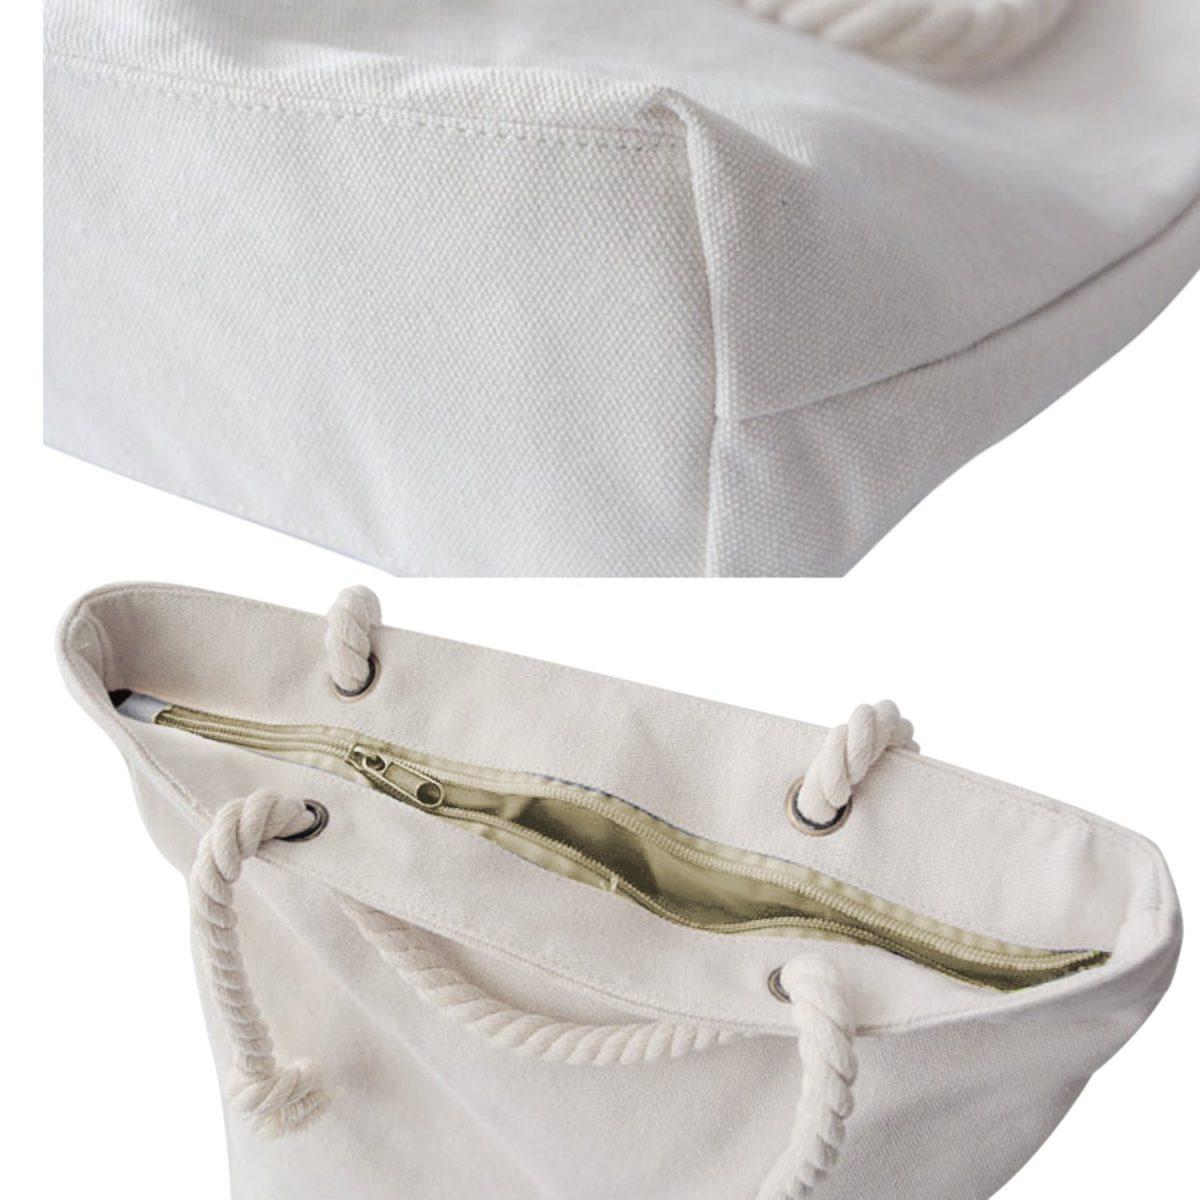 Kurukafa Desenli Geometrik Fermuarlı Kumaş Çanta Realhomes